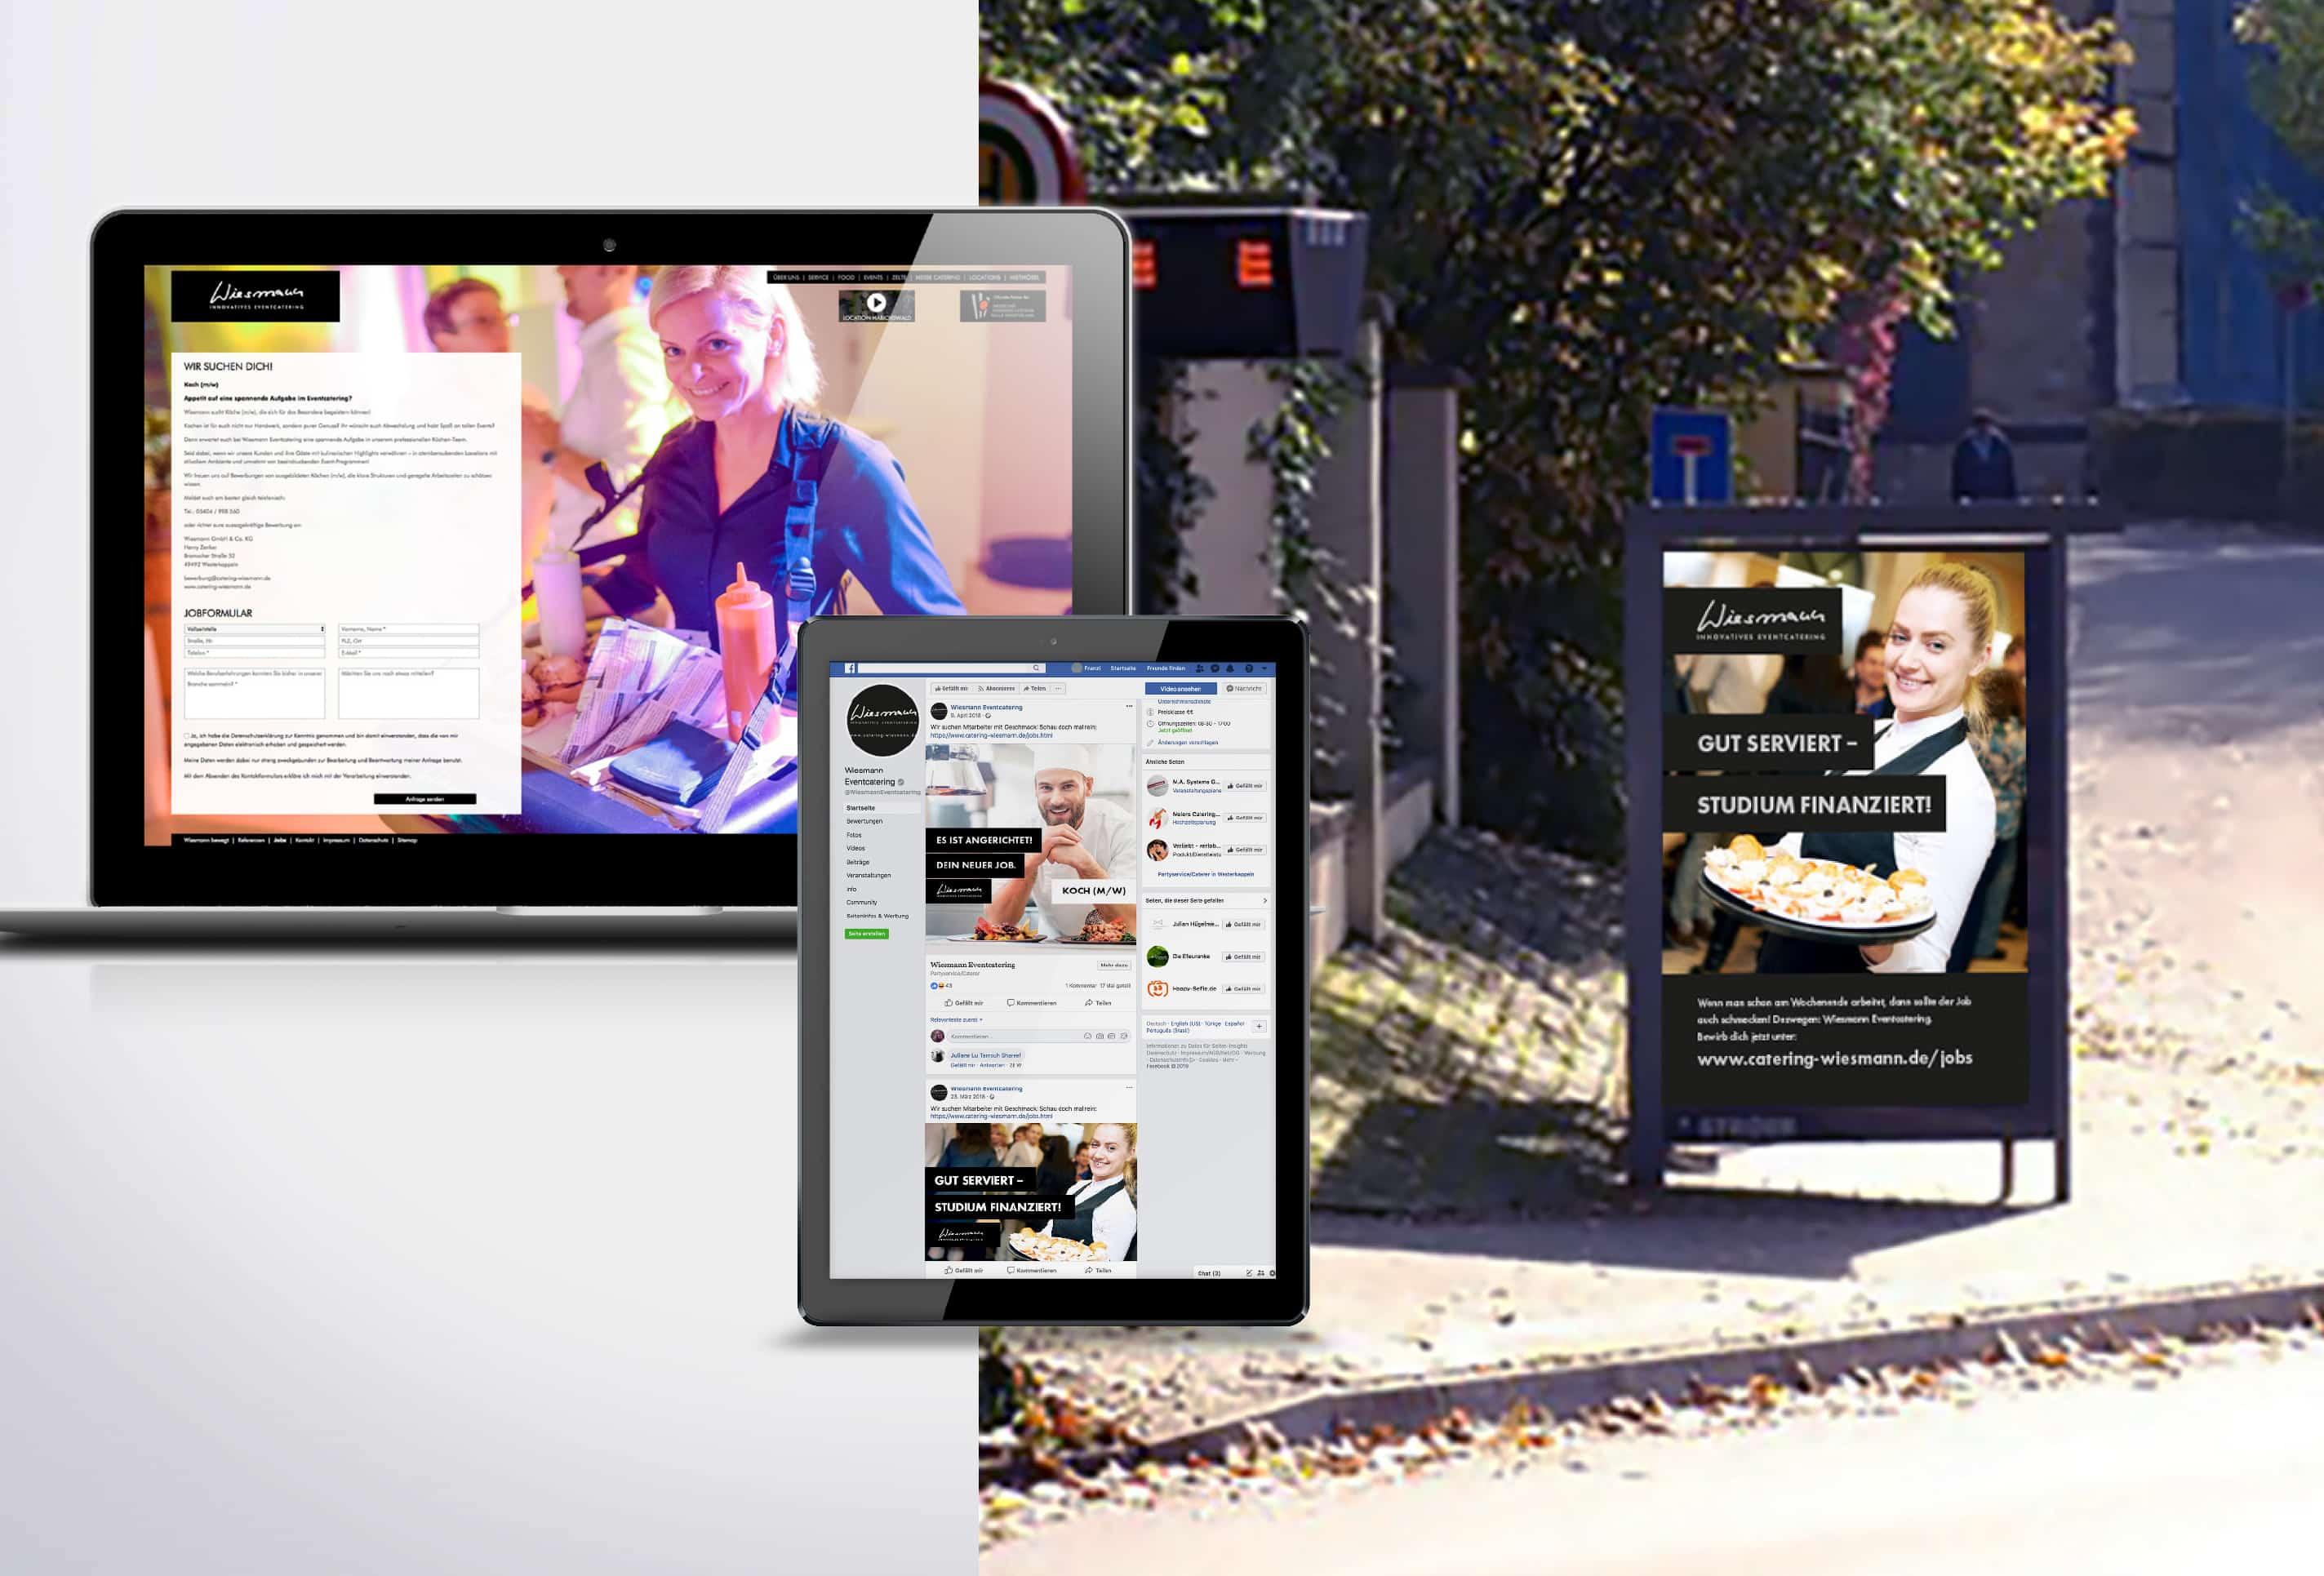 team4media Referenz Personalmarketing Wiessmann Caterina